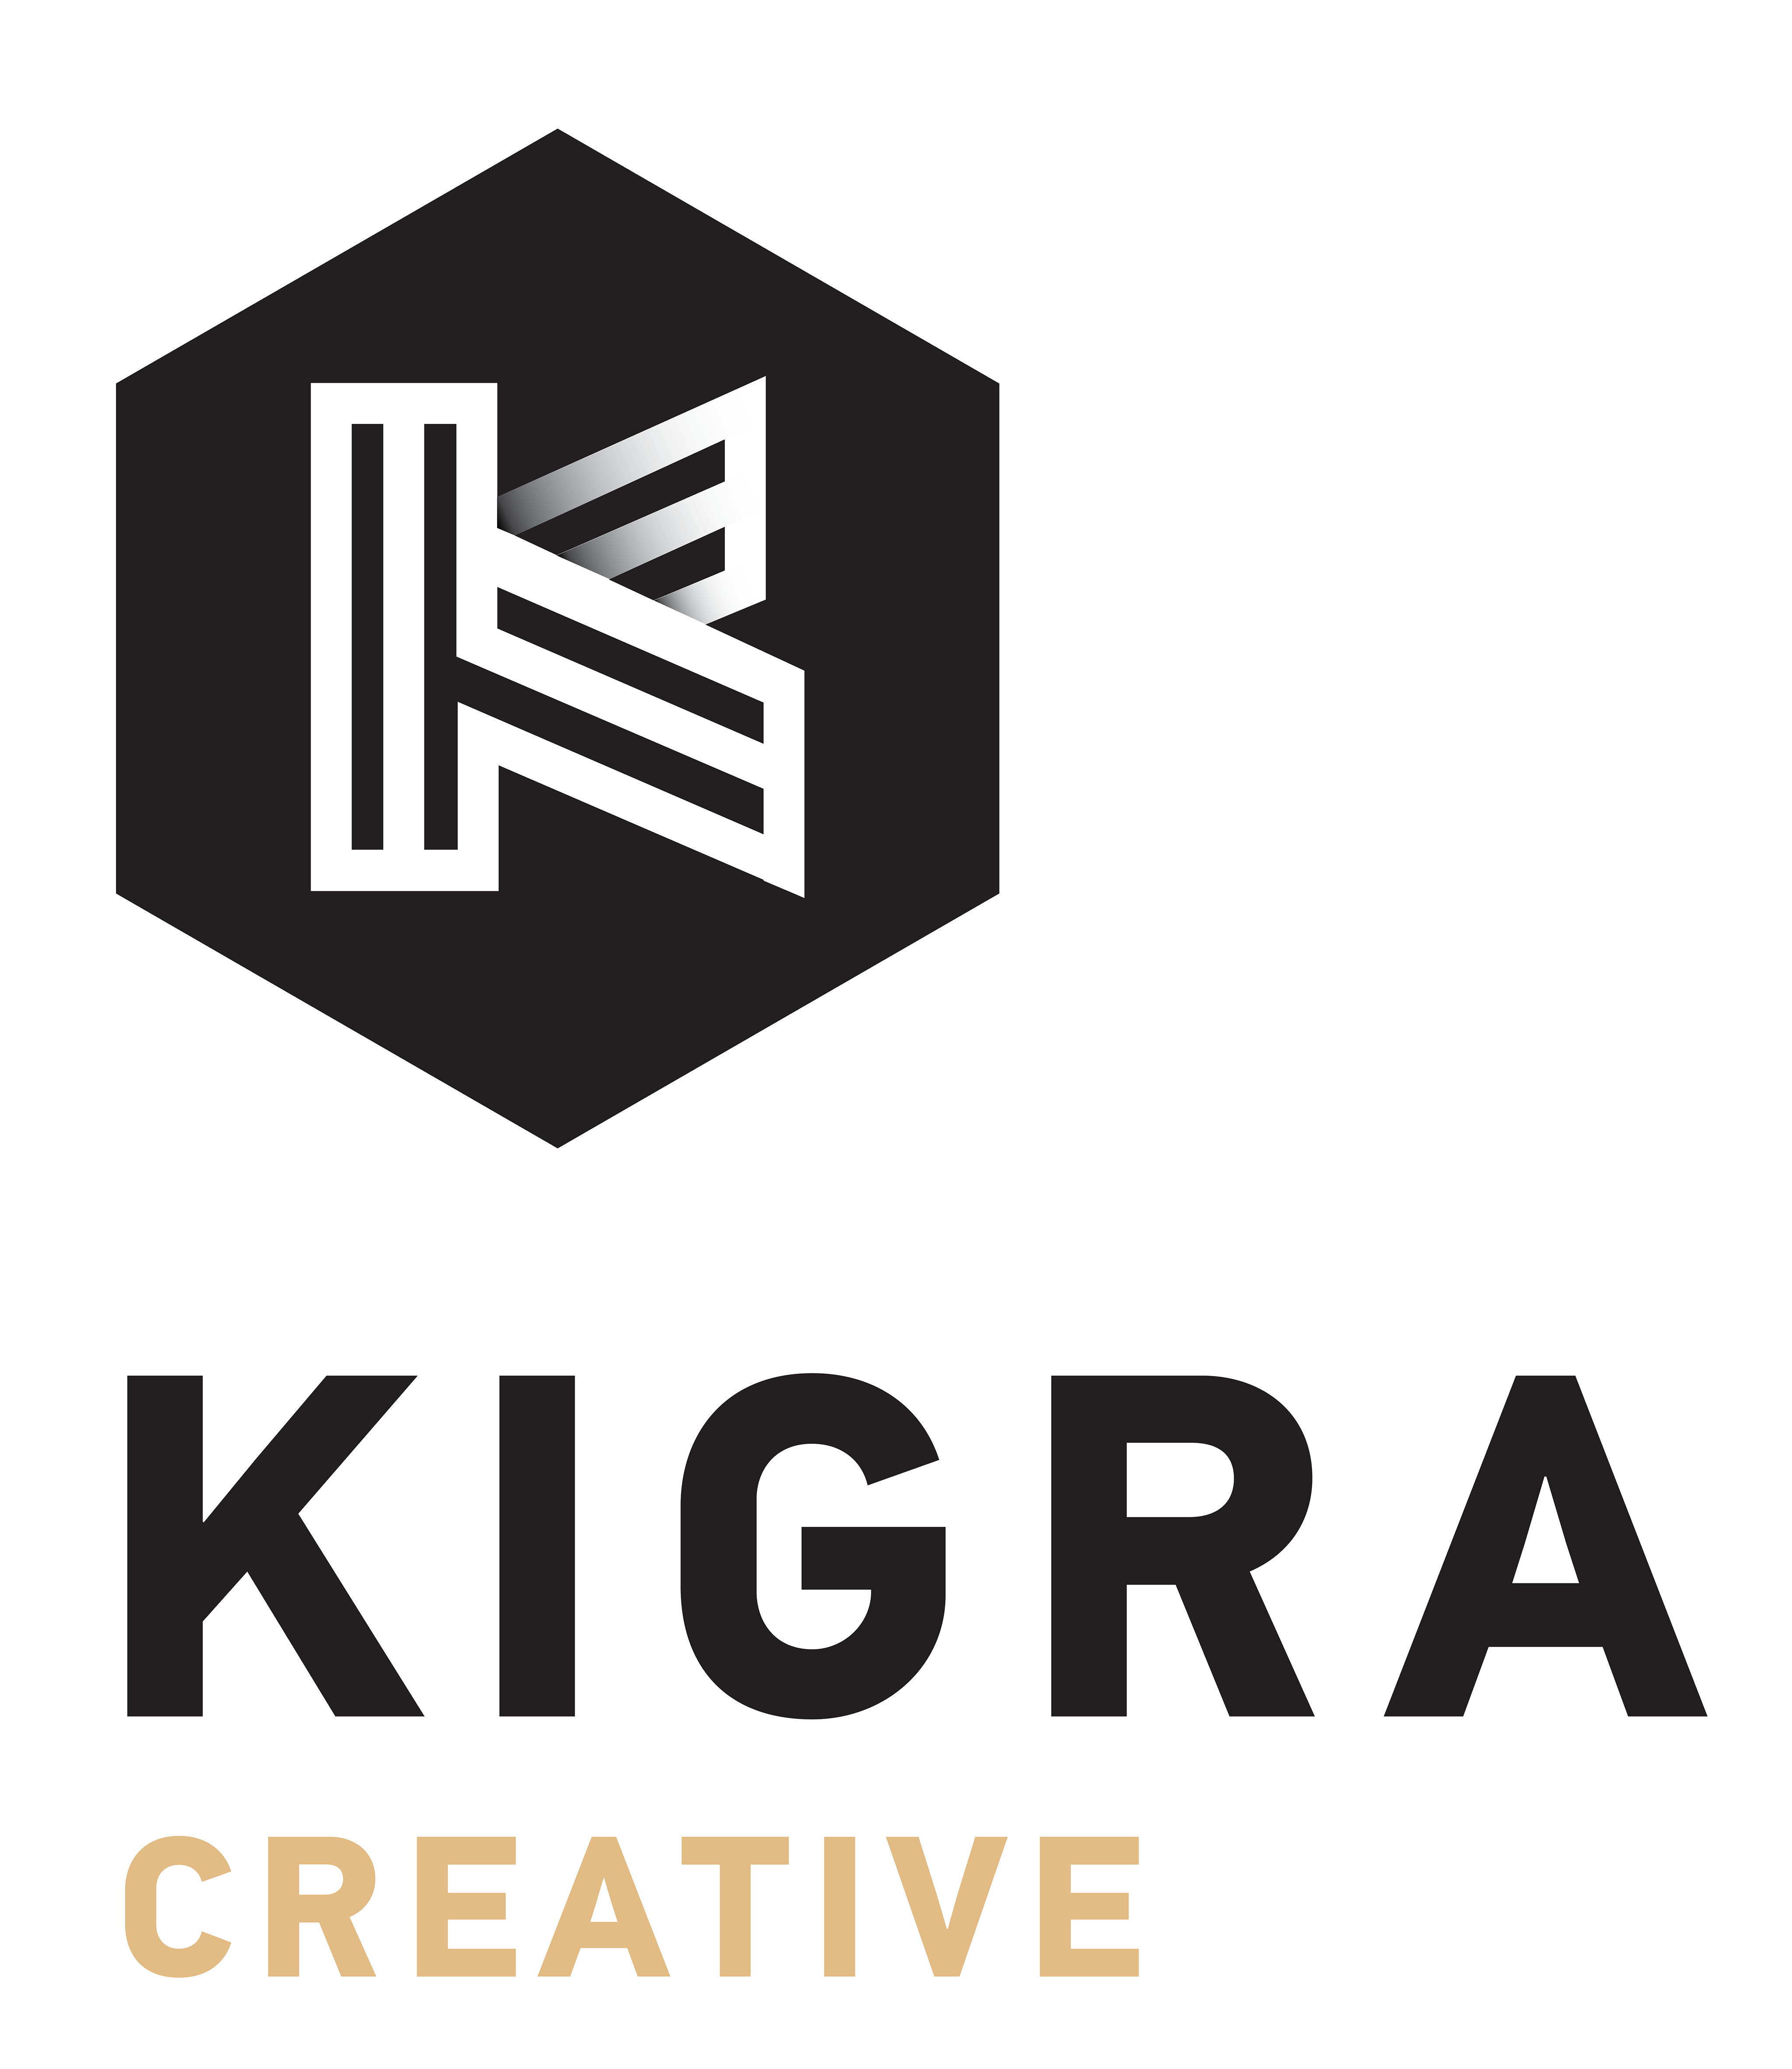 Kigra Creative